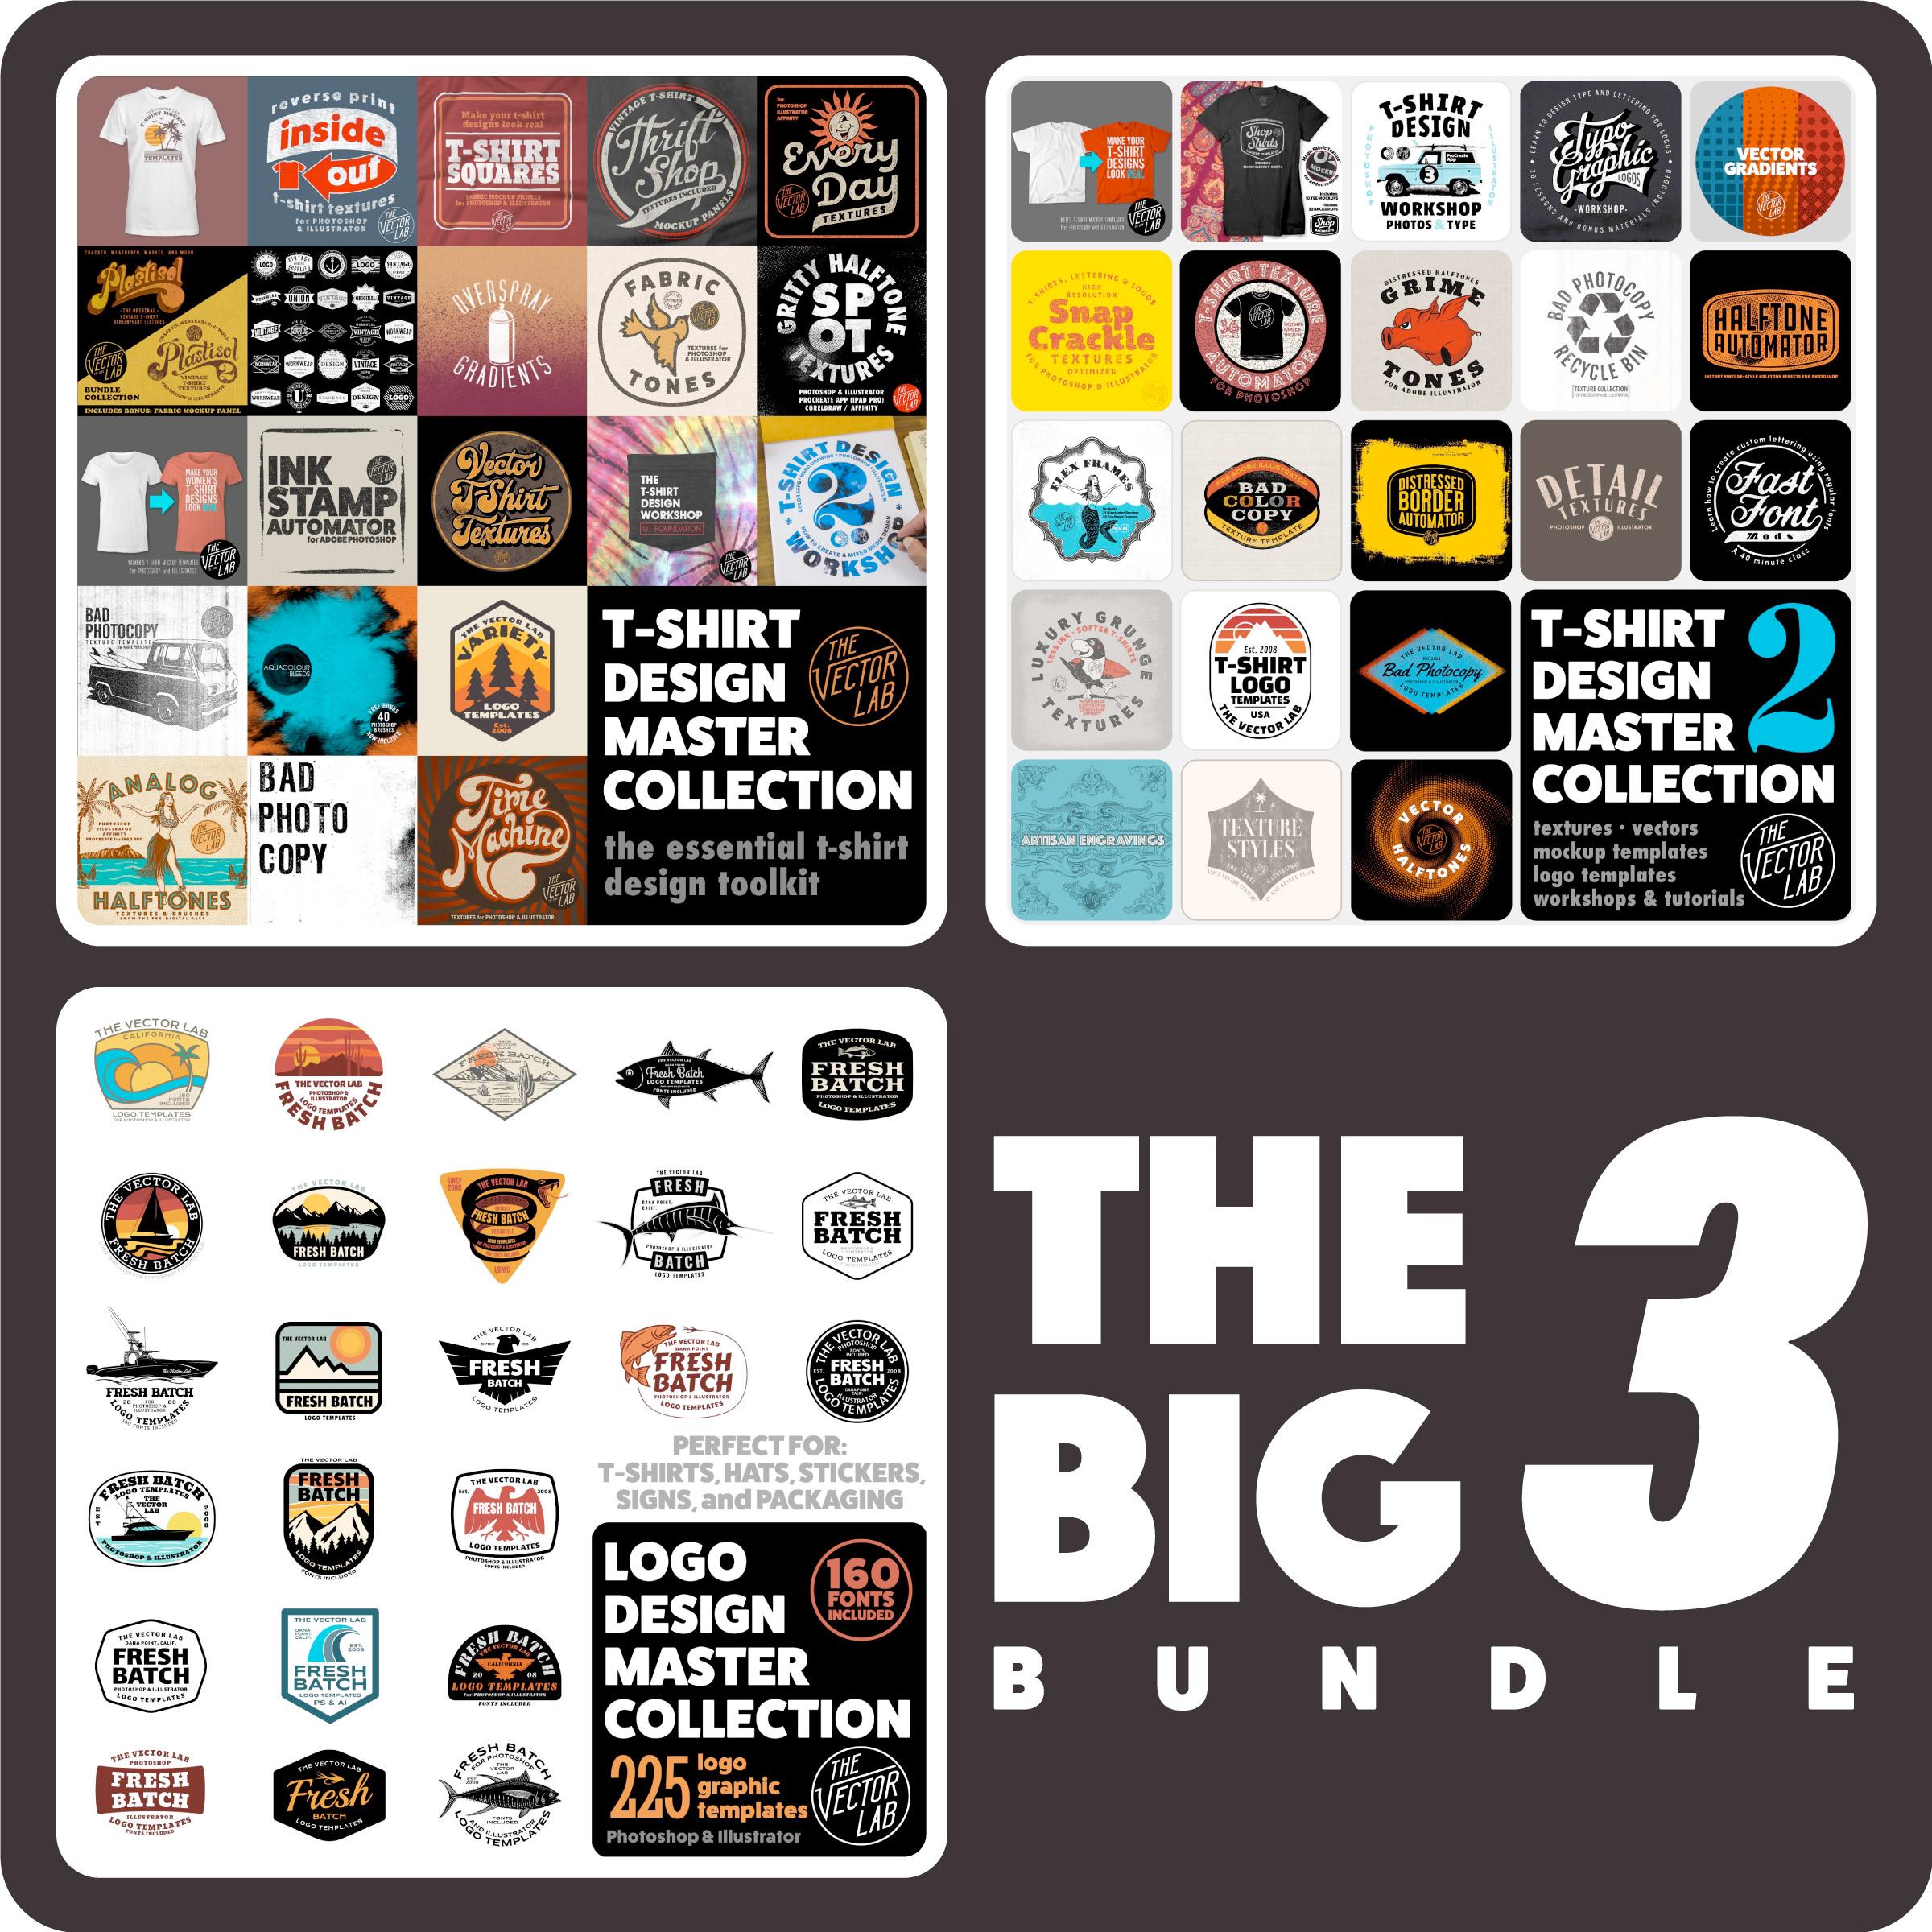 The-Big-3-Bundle-01.jpg